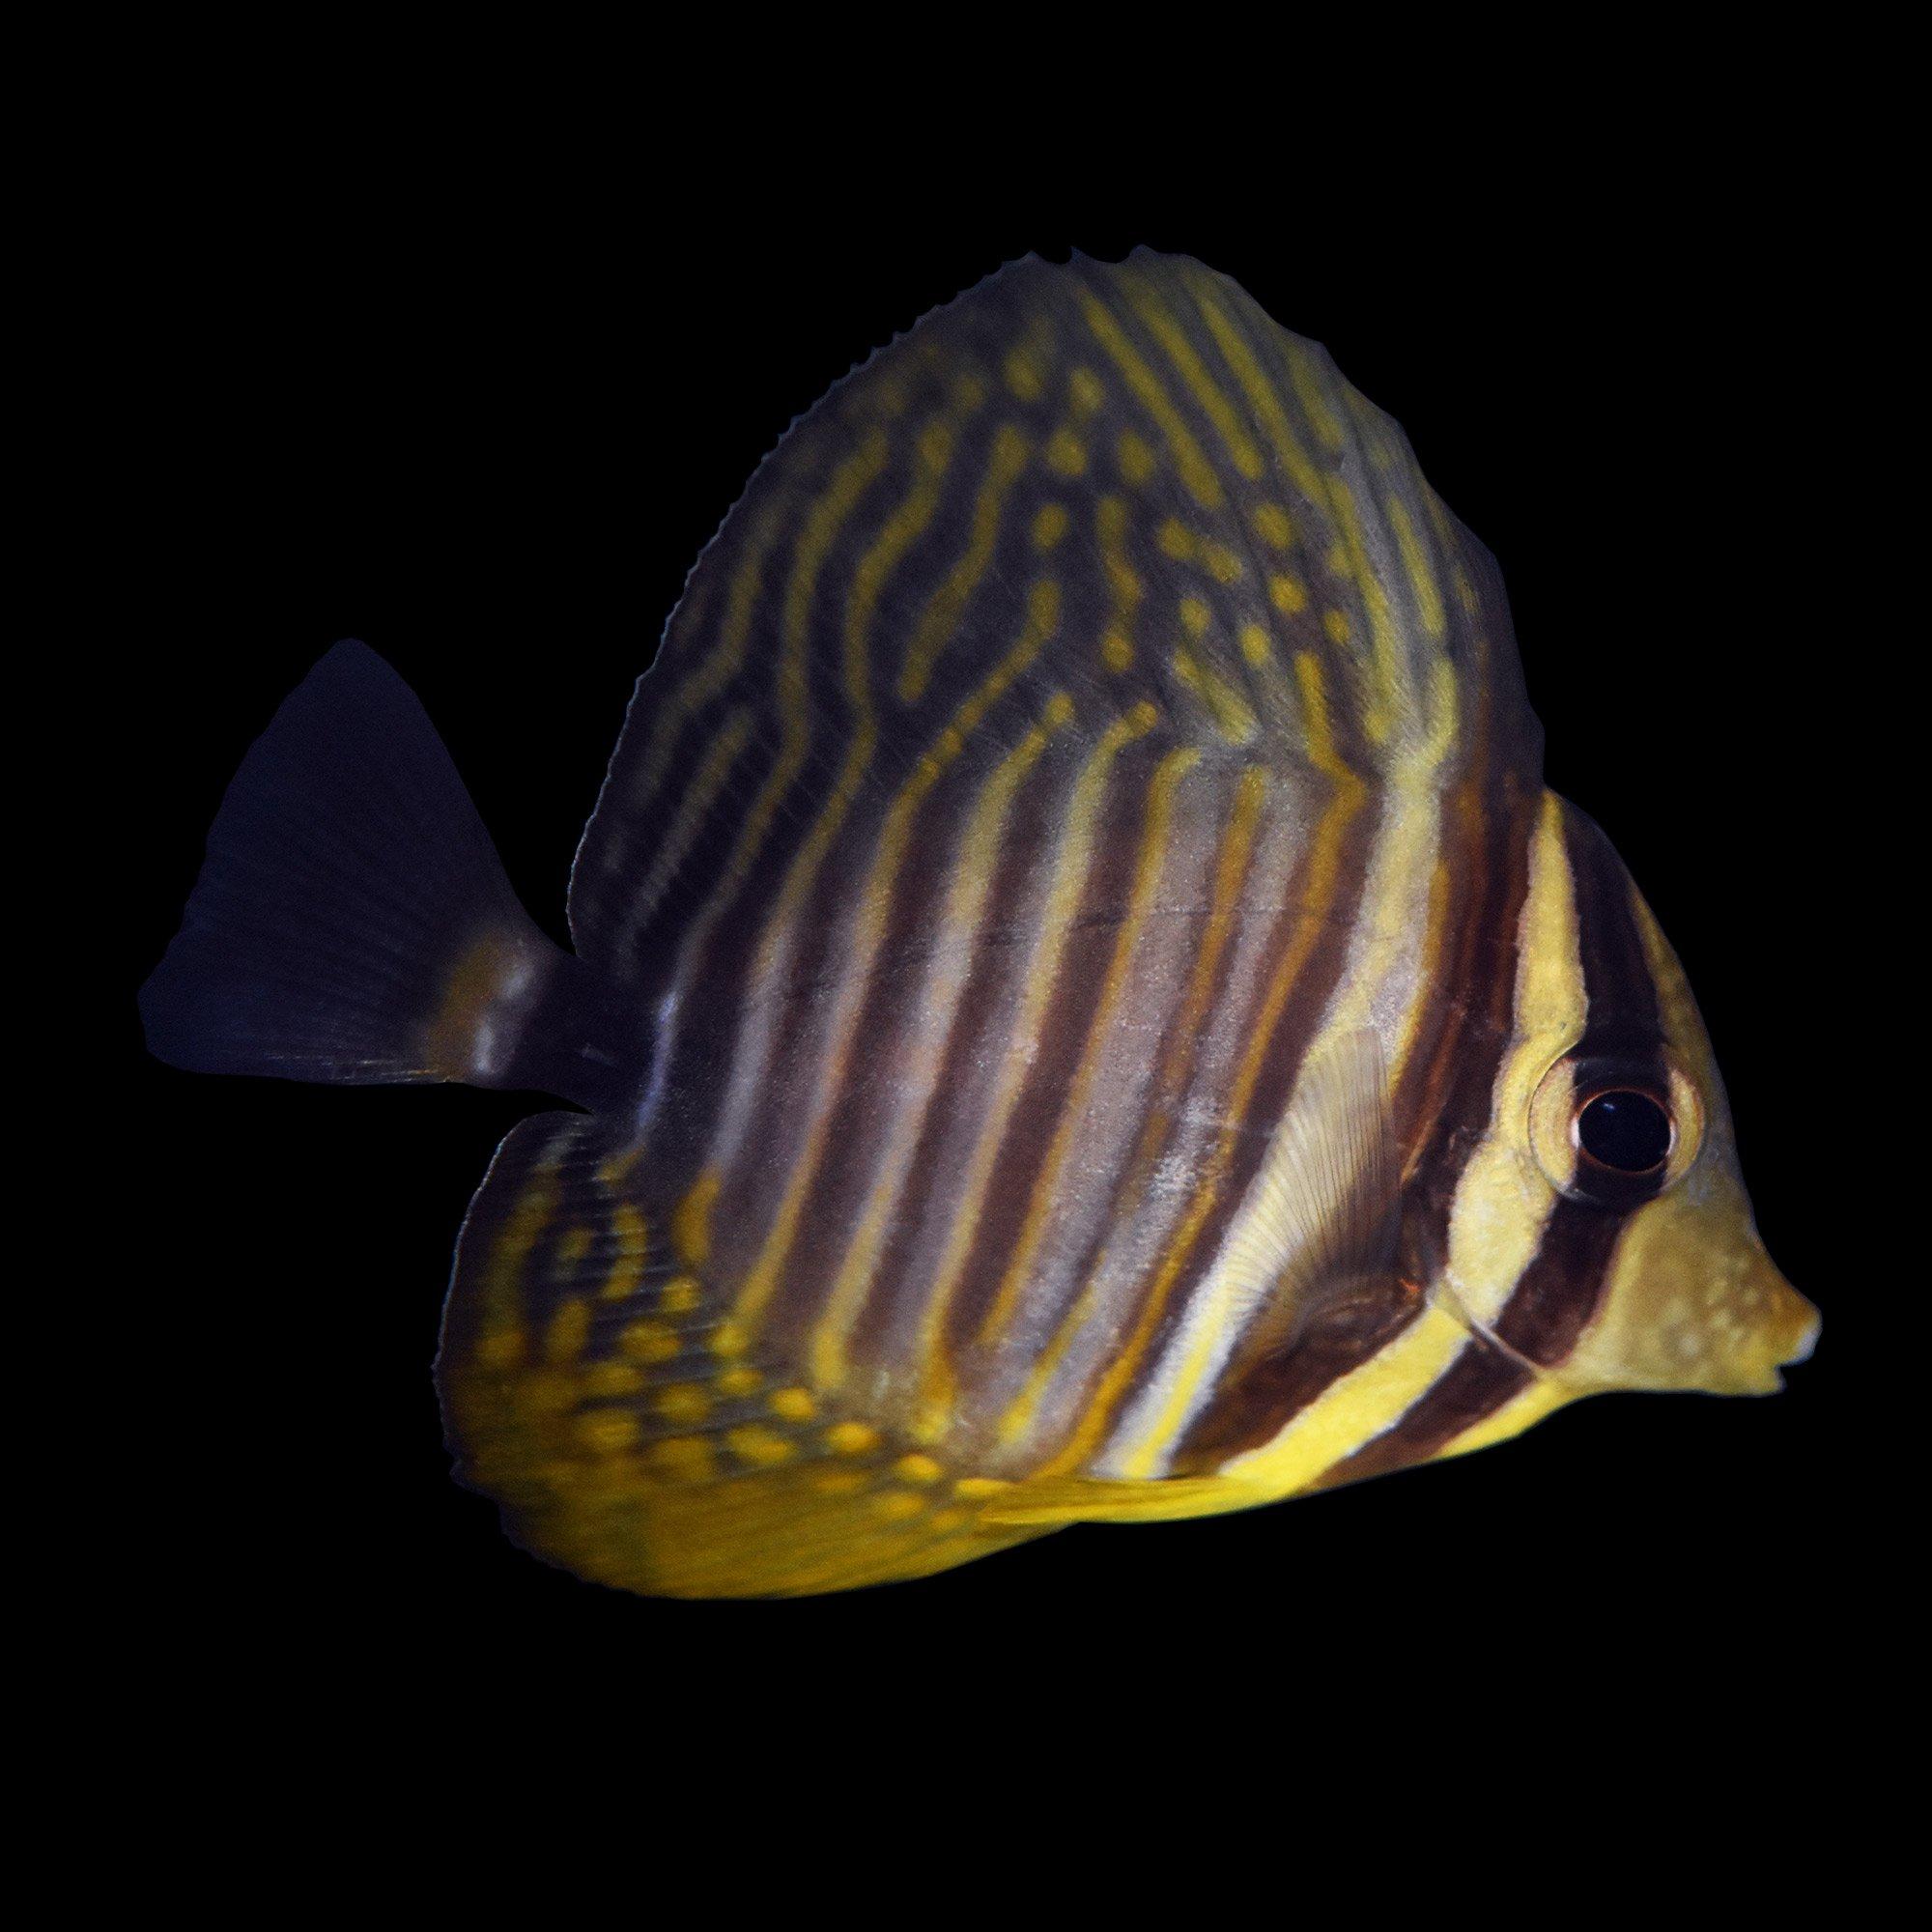 Sailfin tang petco for Petco saltwater fish